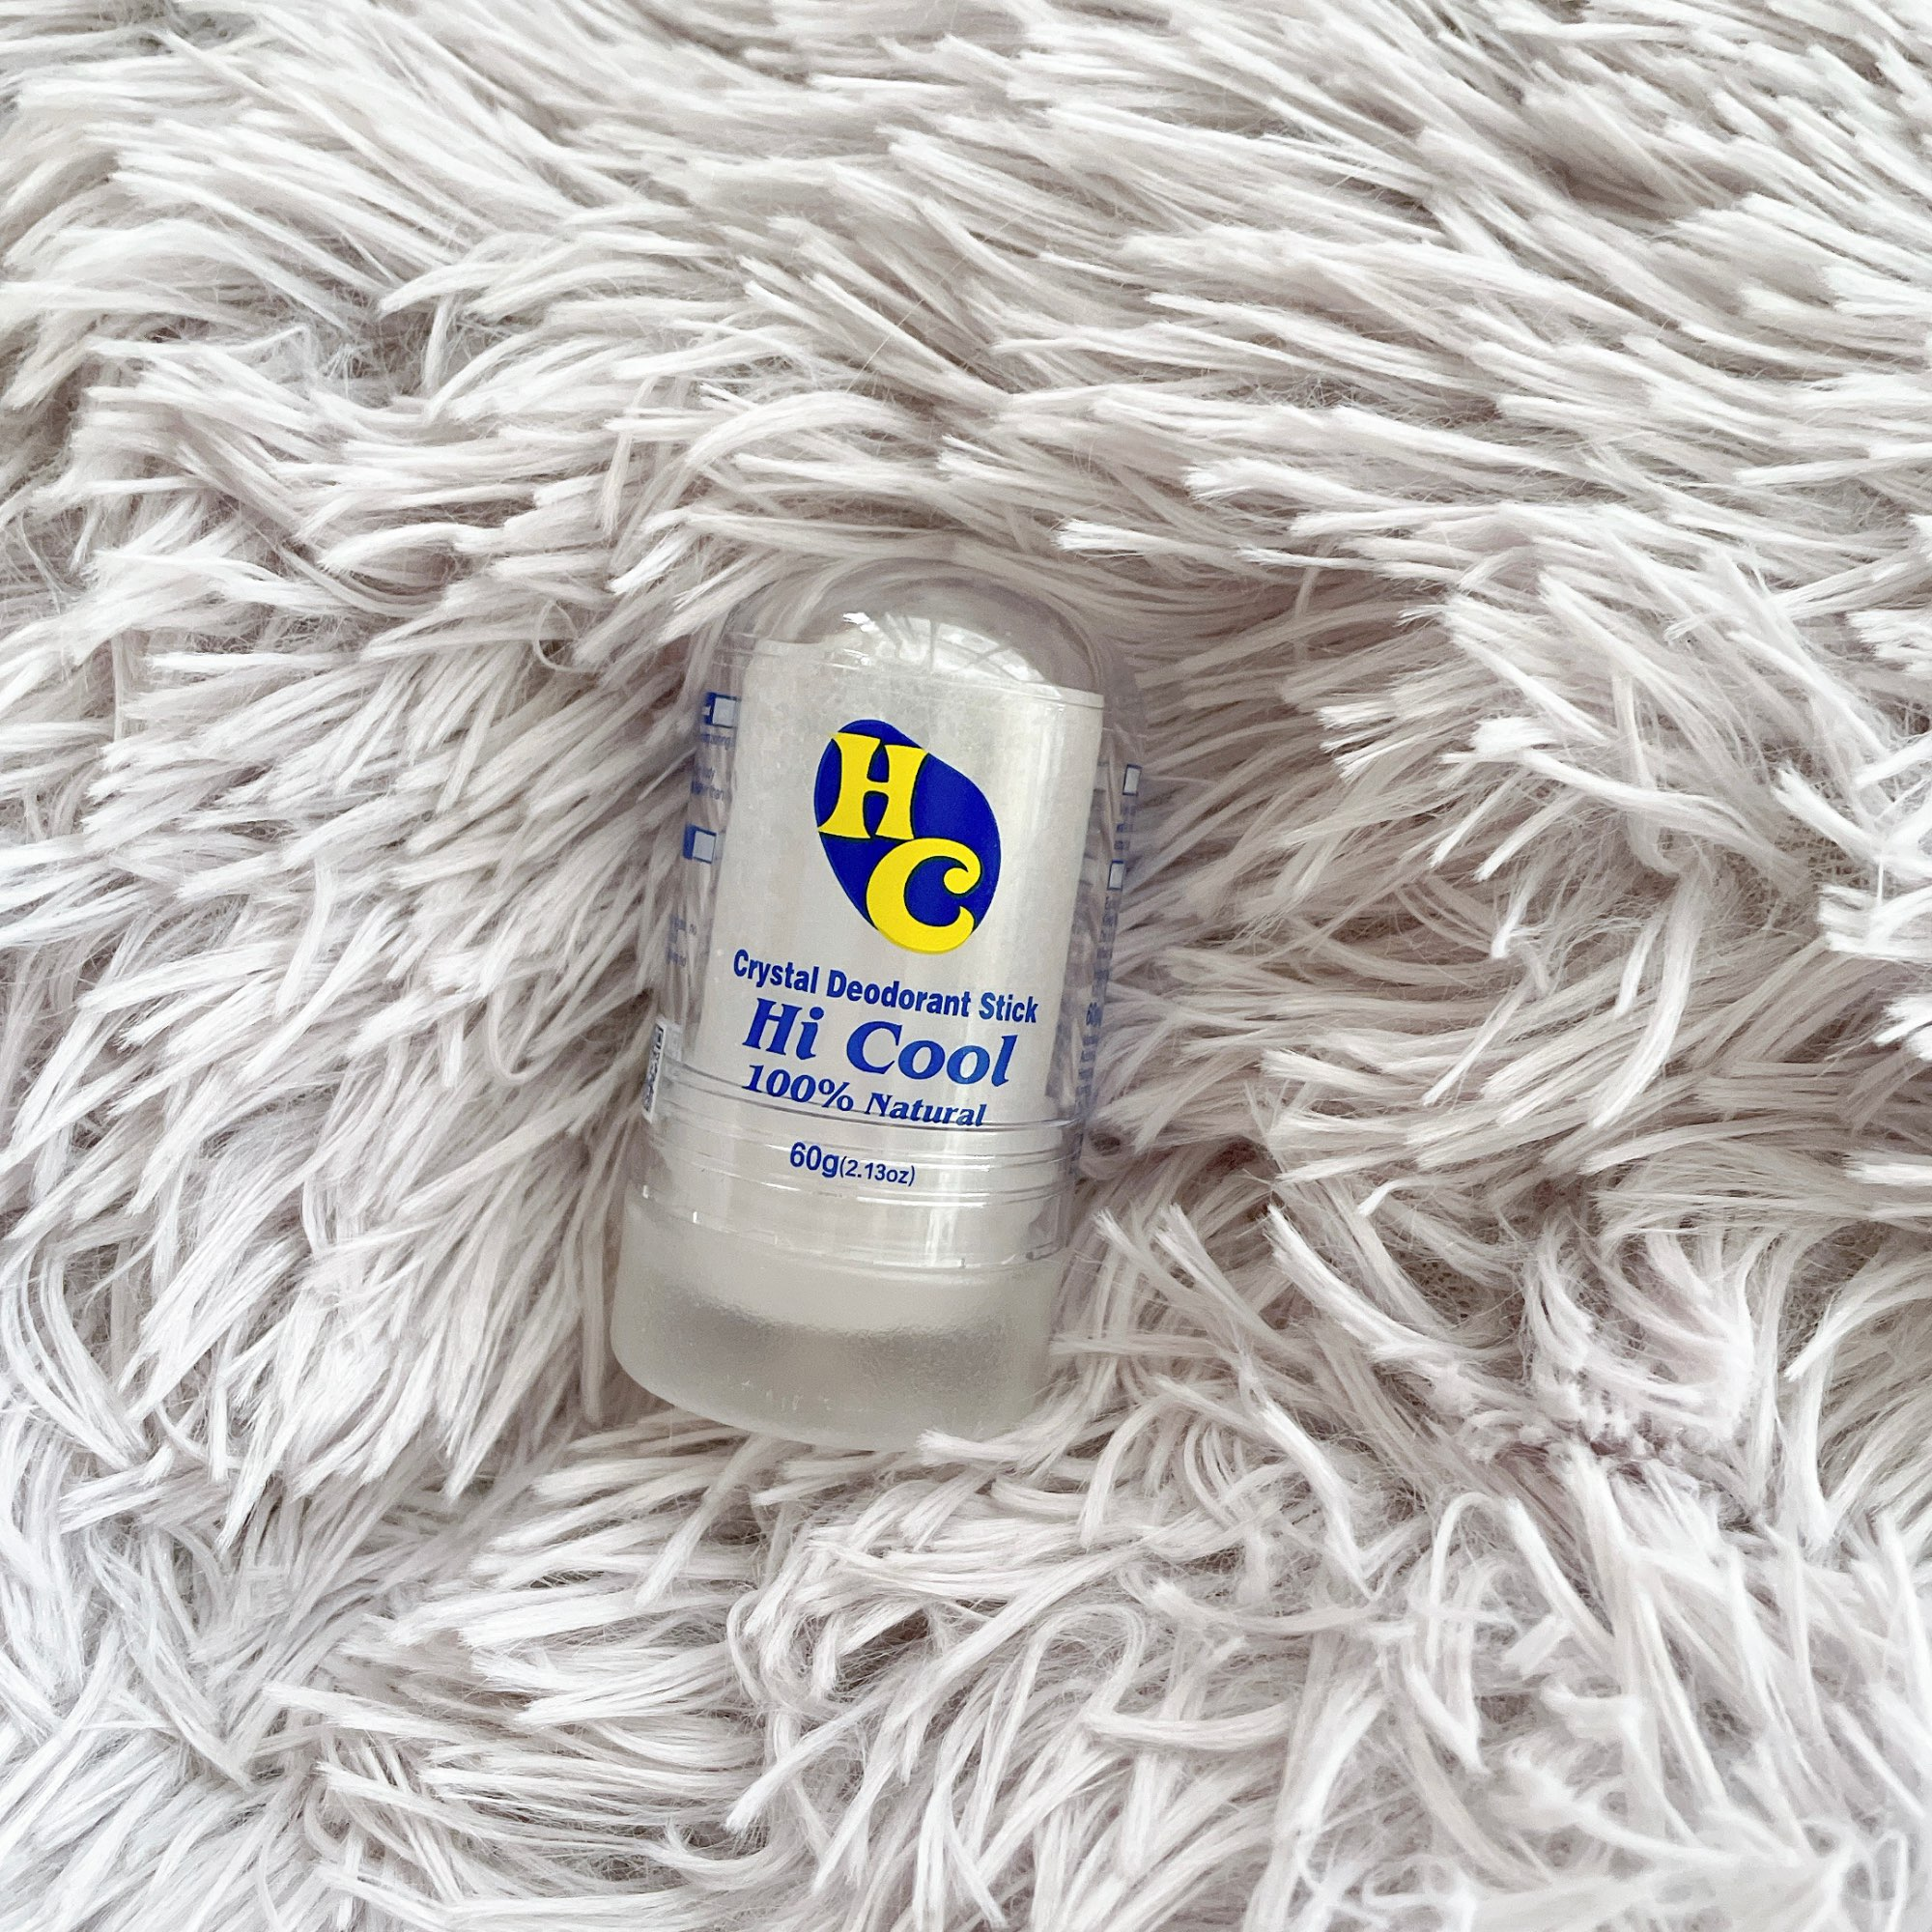 OEDO Natural Rhinestone Deodorant - Alum Stick Body Odor Remover and Antiperspirant photo review